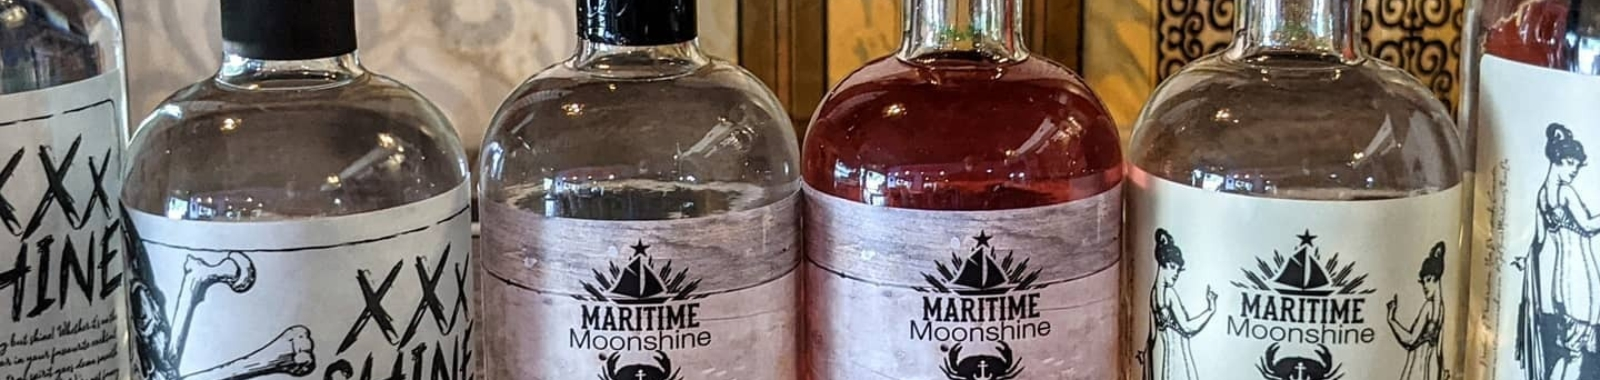 Maritime moonshine header